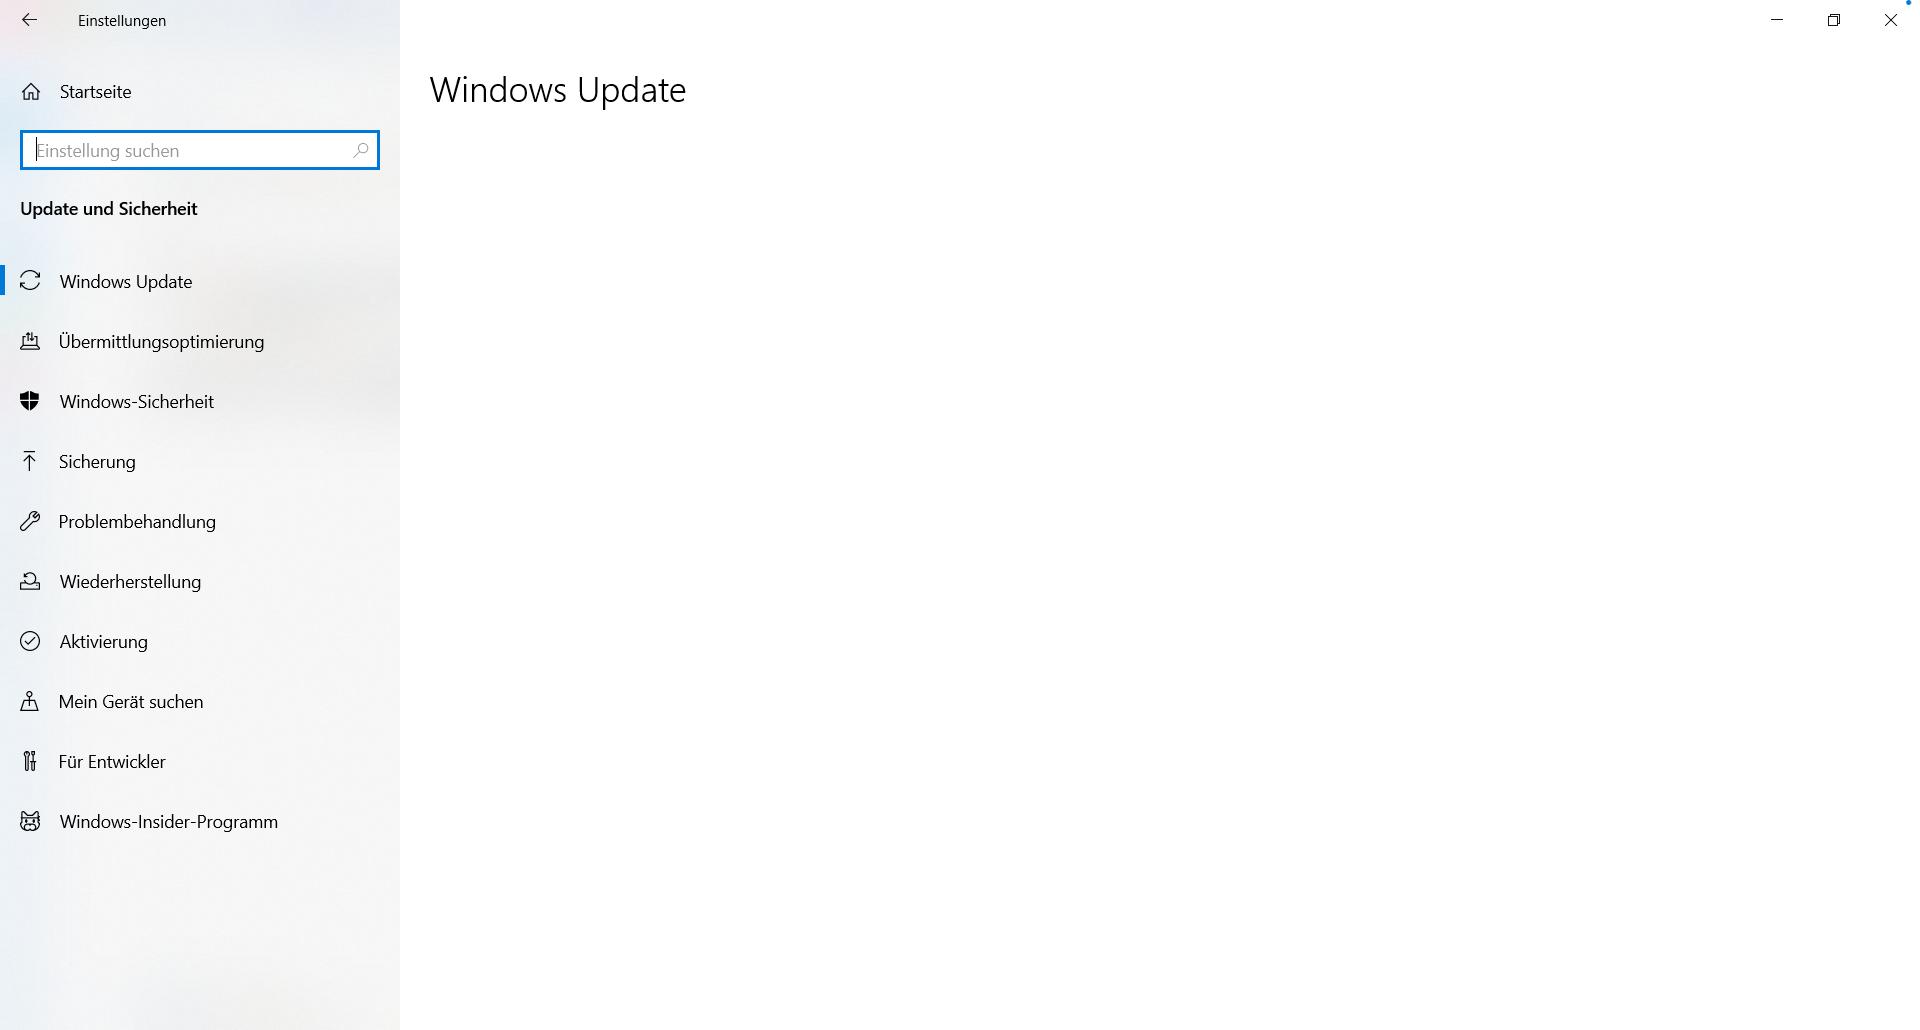 windows update problems 6f306310-9a58-4c8f-8ed7-b8fc9036c47b?upload=true.png